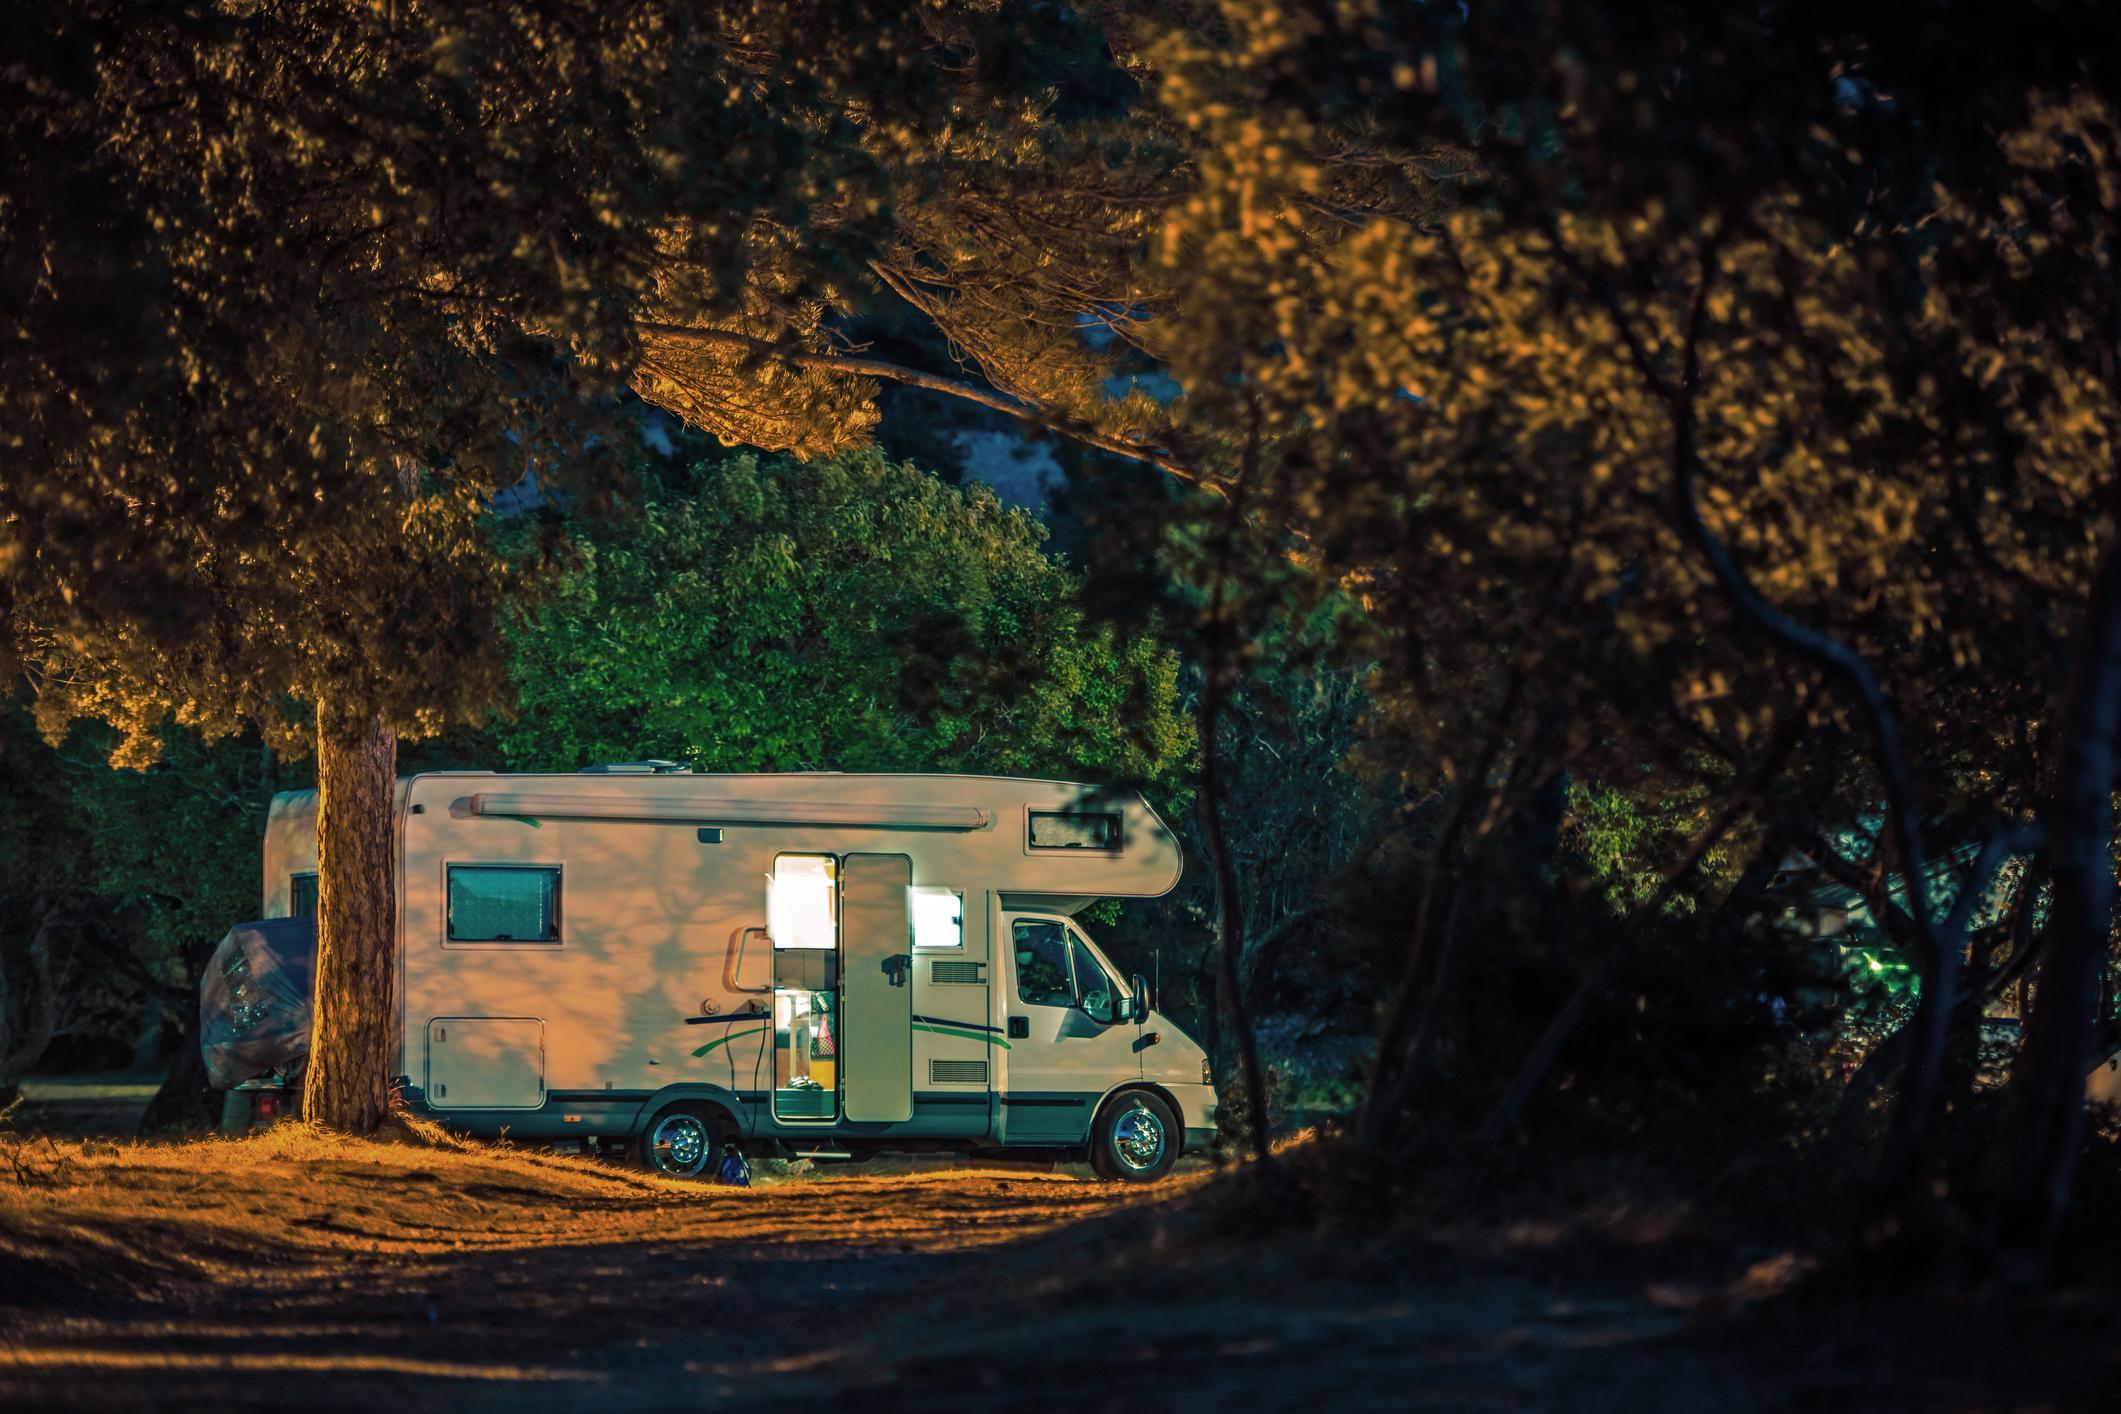 Motorhome Vacation Travel. Calm Camping Night inside RV Camper Van.